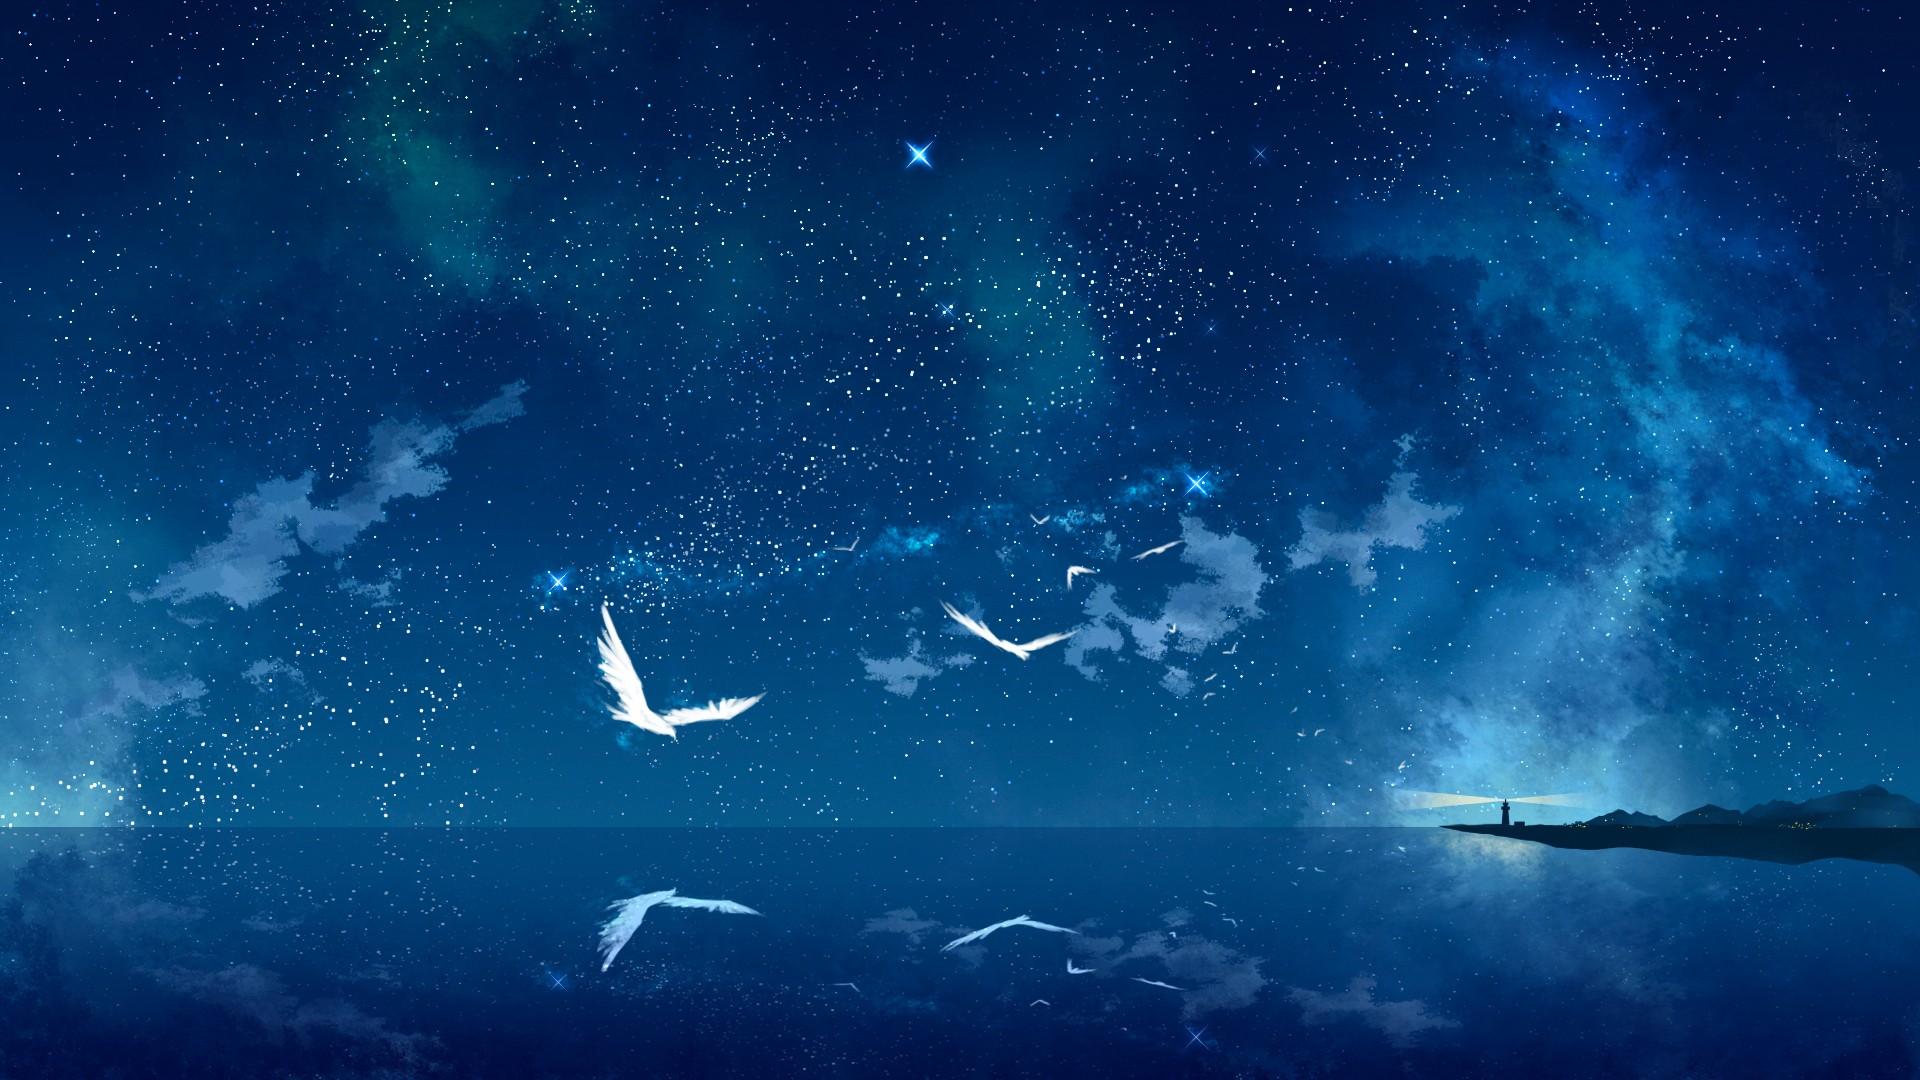 Widescreen Anime Scenery Wallpaper 1920x1080